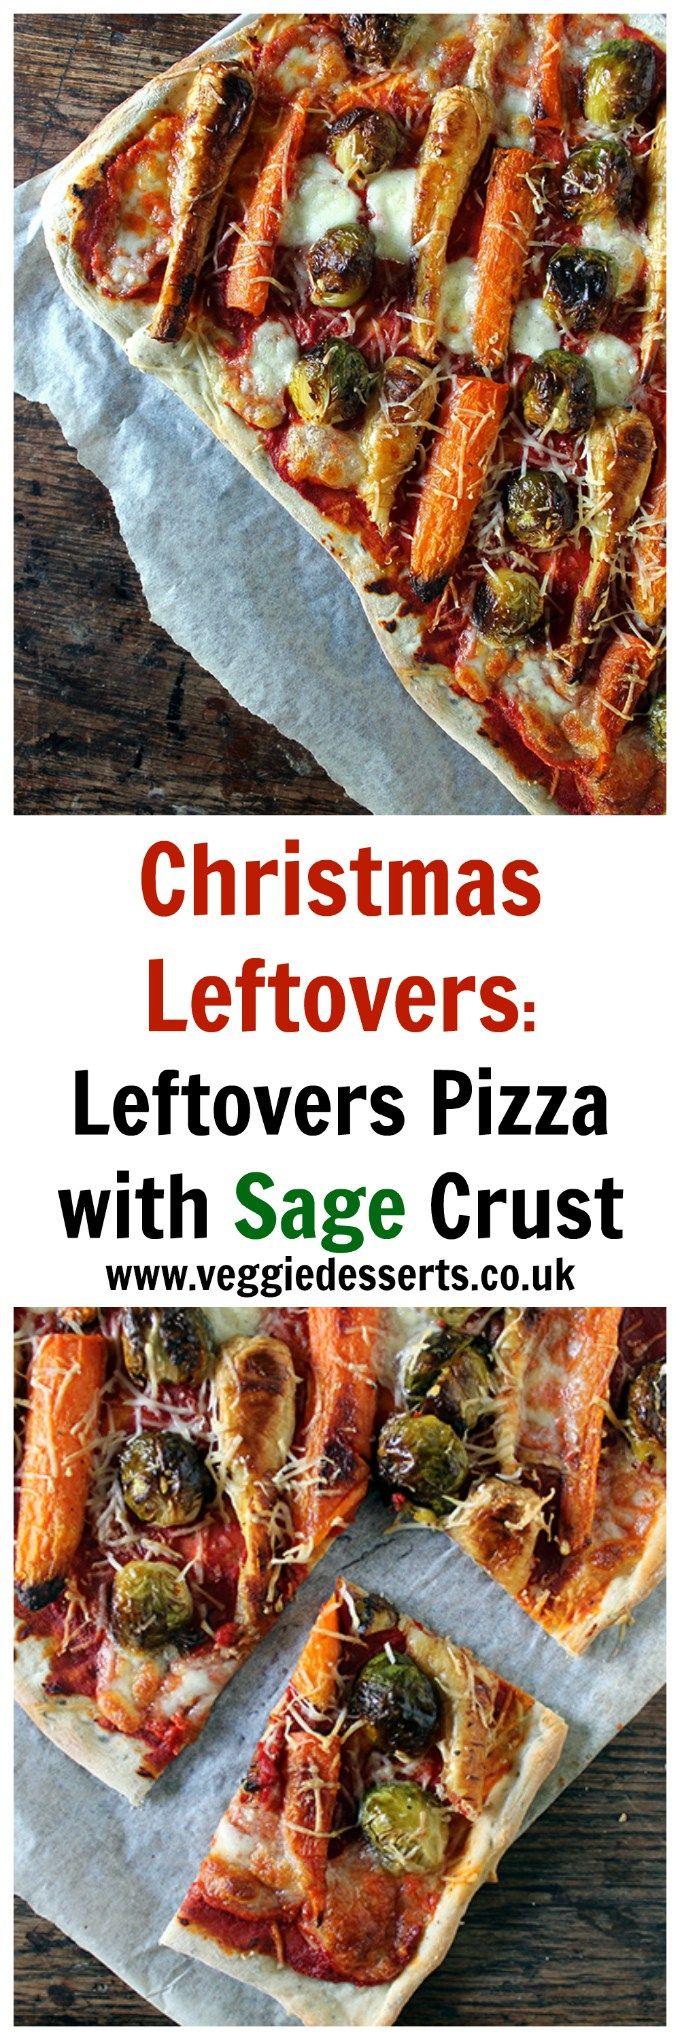 Christmas Leftover Recipes: Leftovers Pizza with Sage Crust | Veggie Desserts Blog